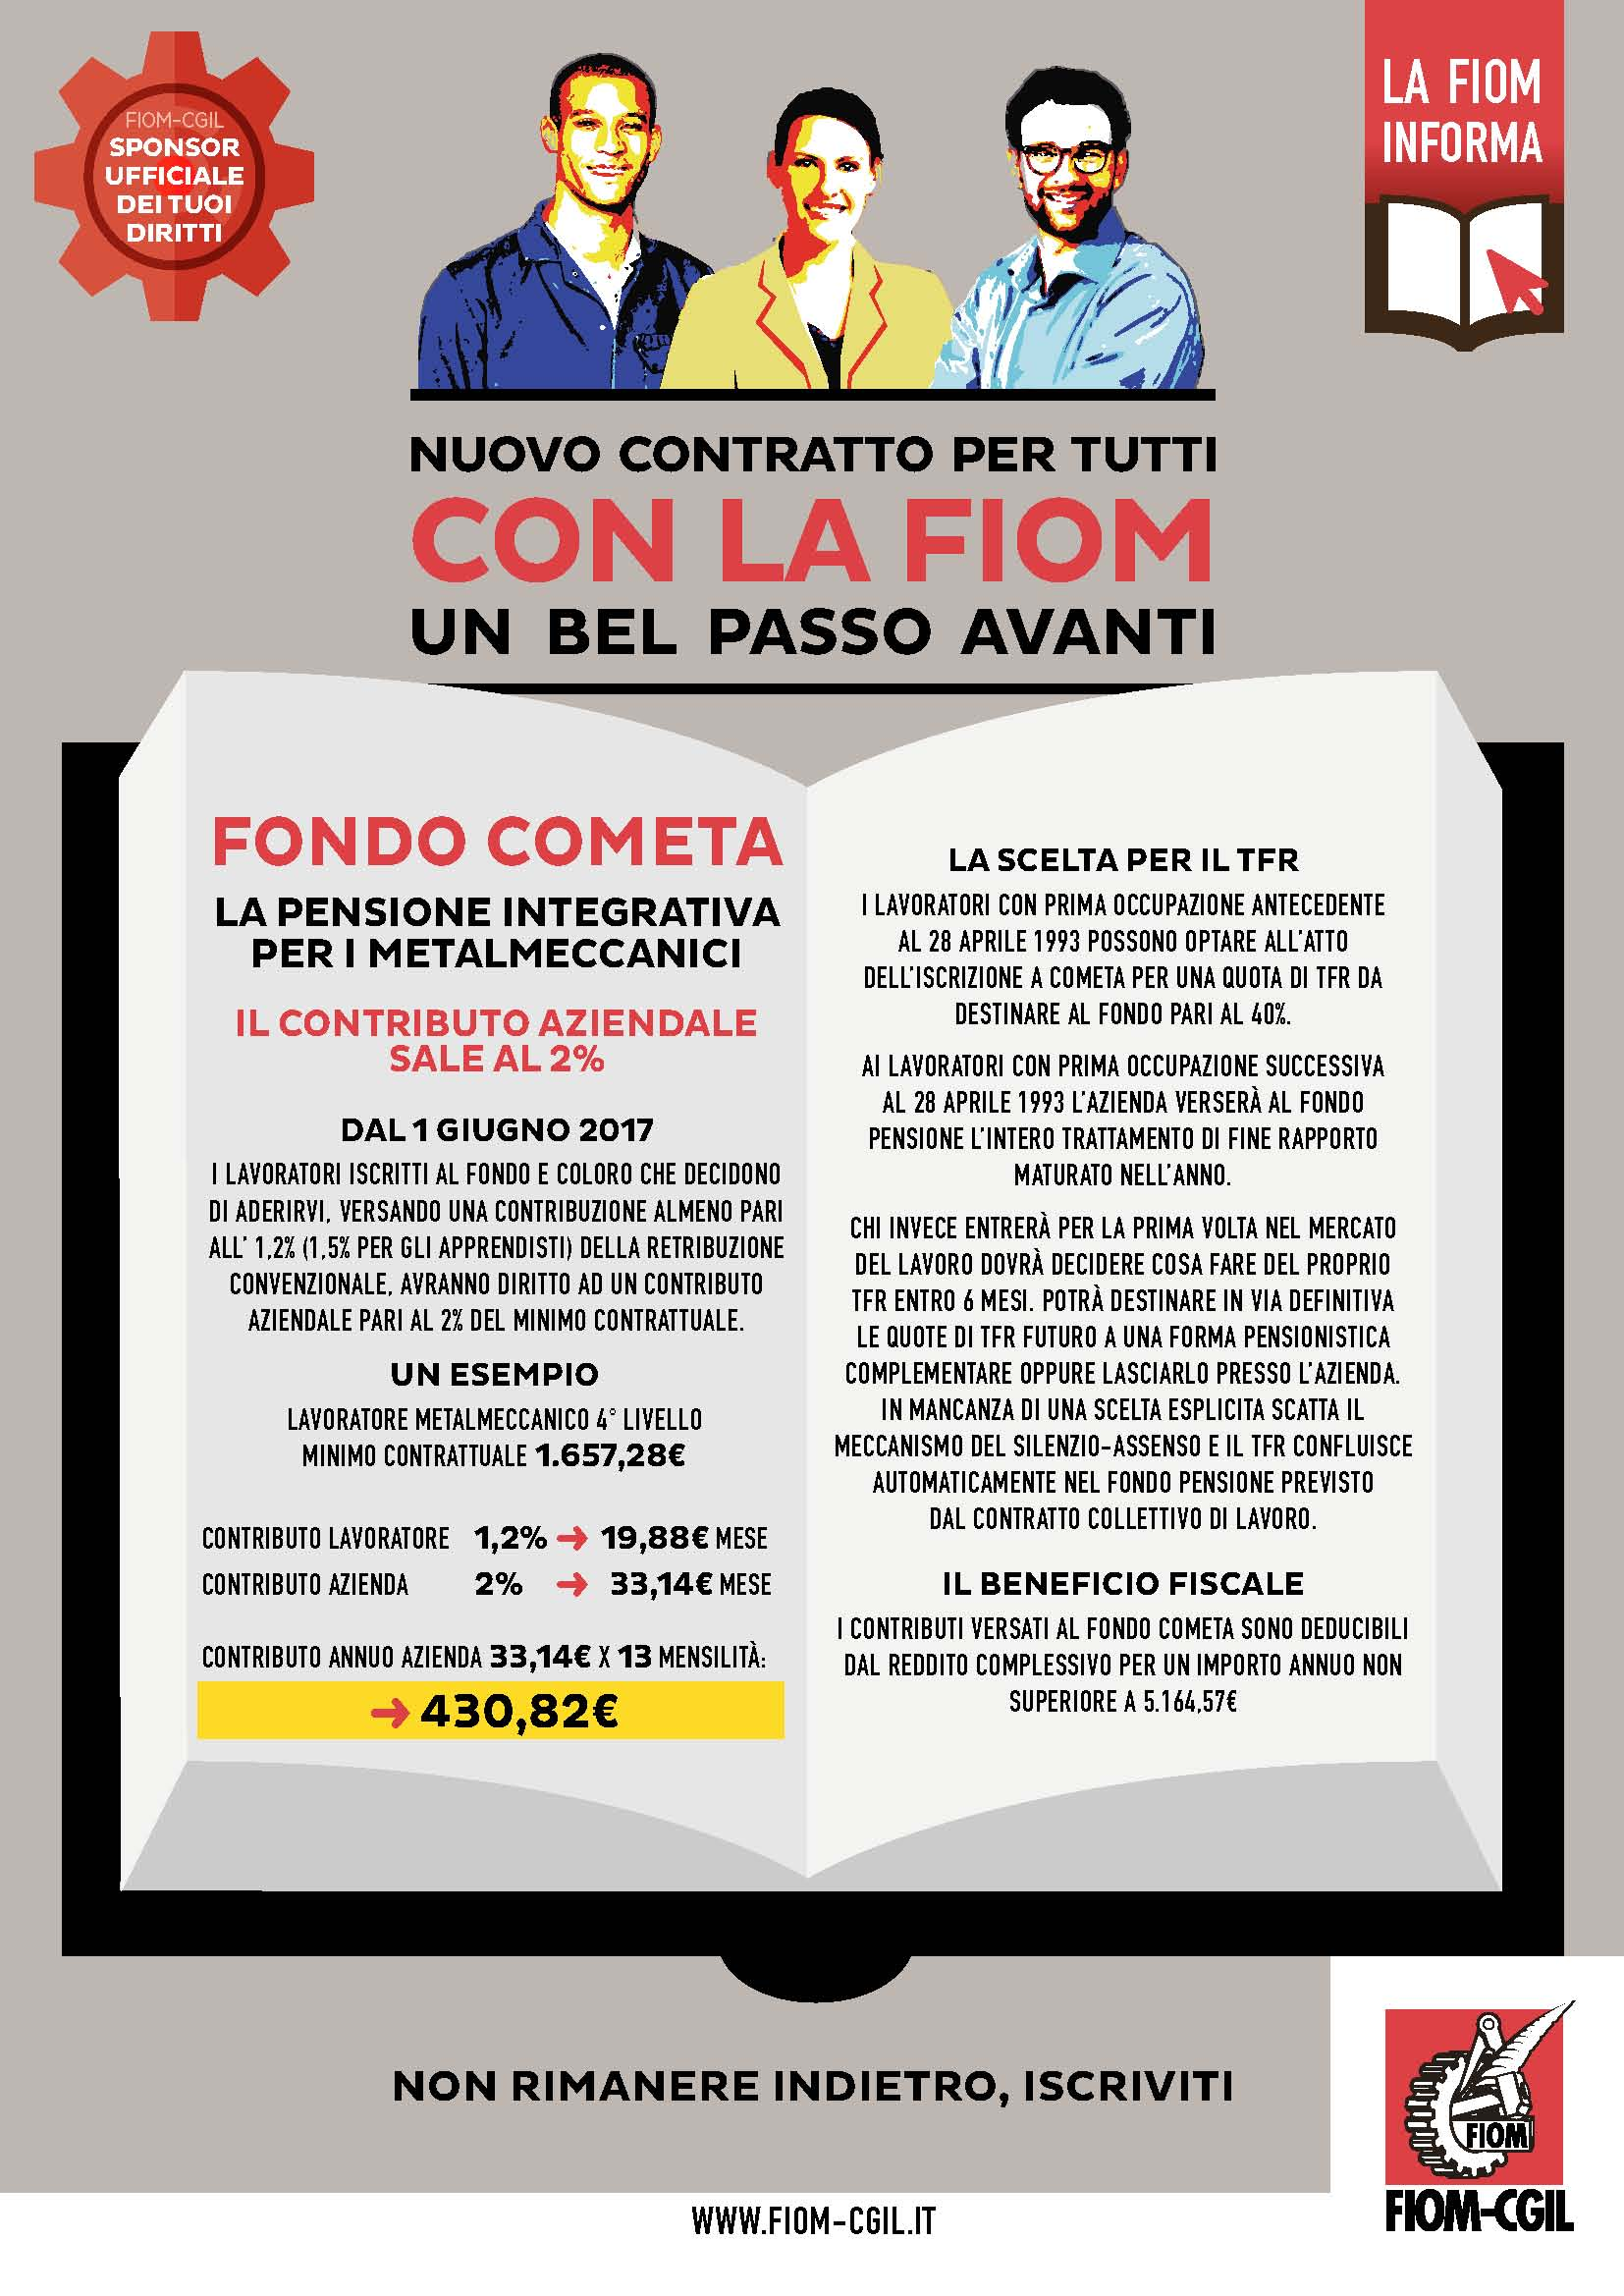 17 04 19 ccnl Fondo Cometa